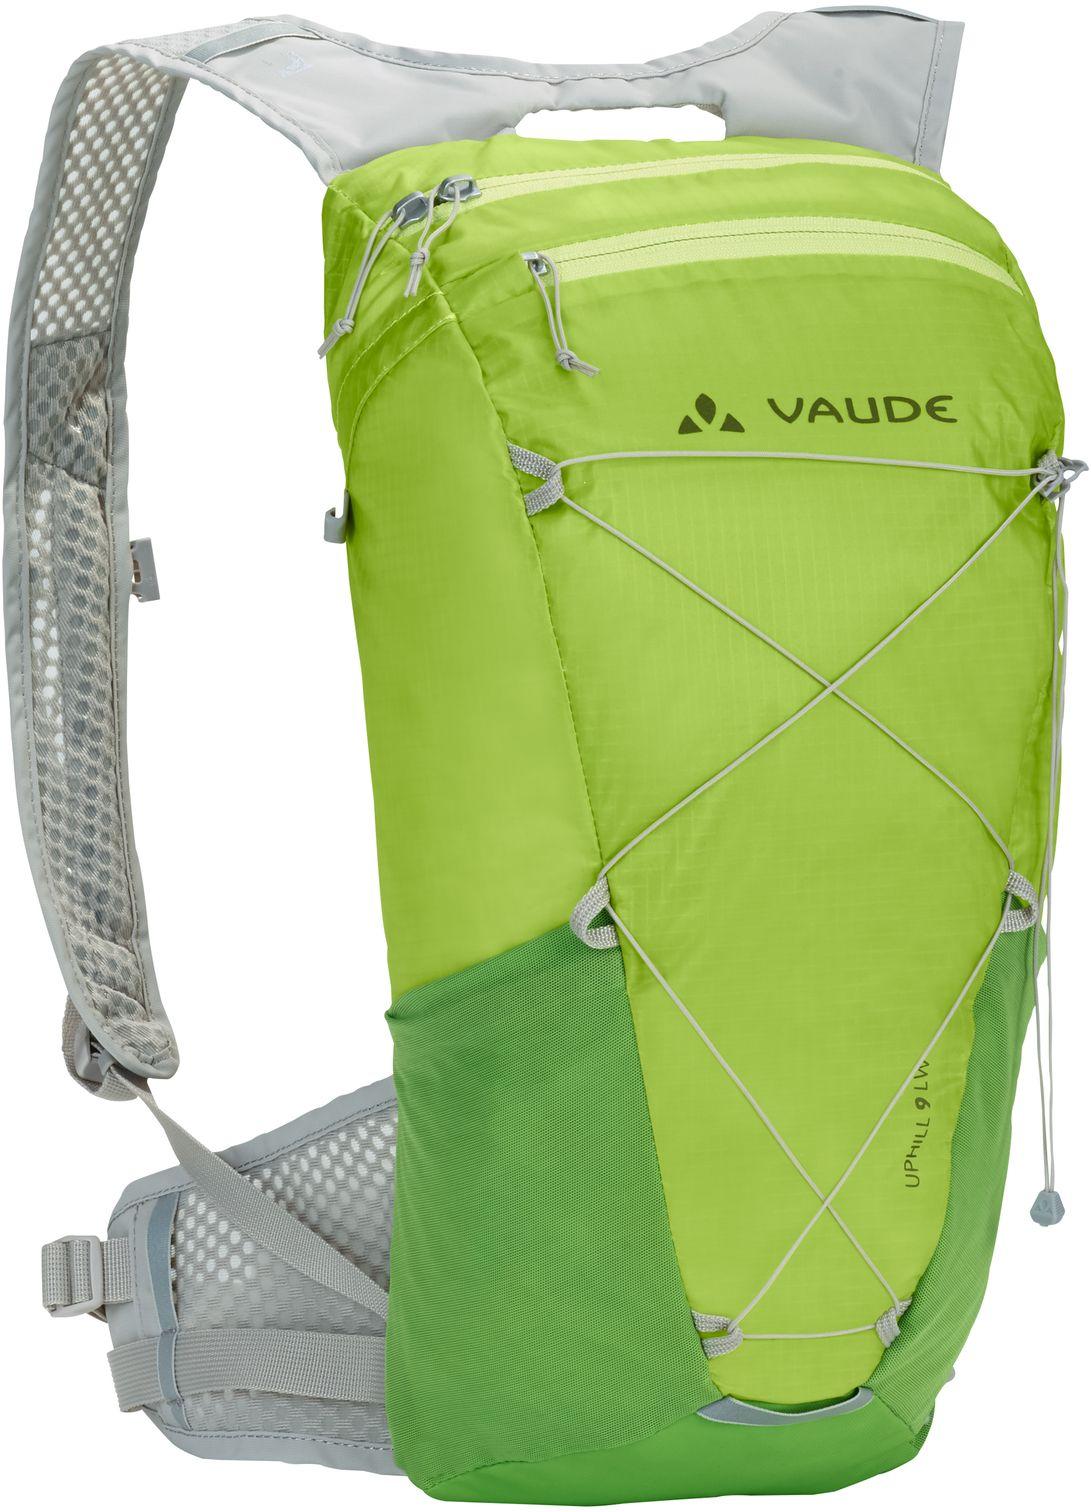 Vaude Uphill 9 LW - pear uni